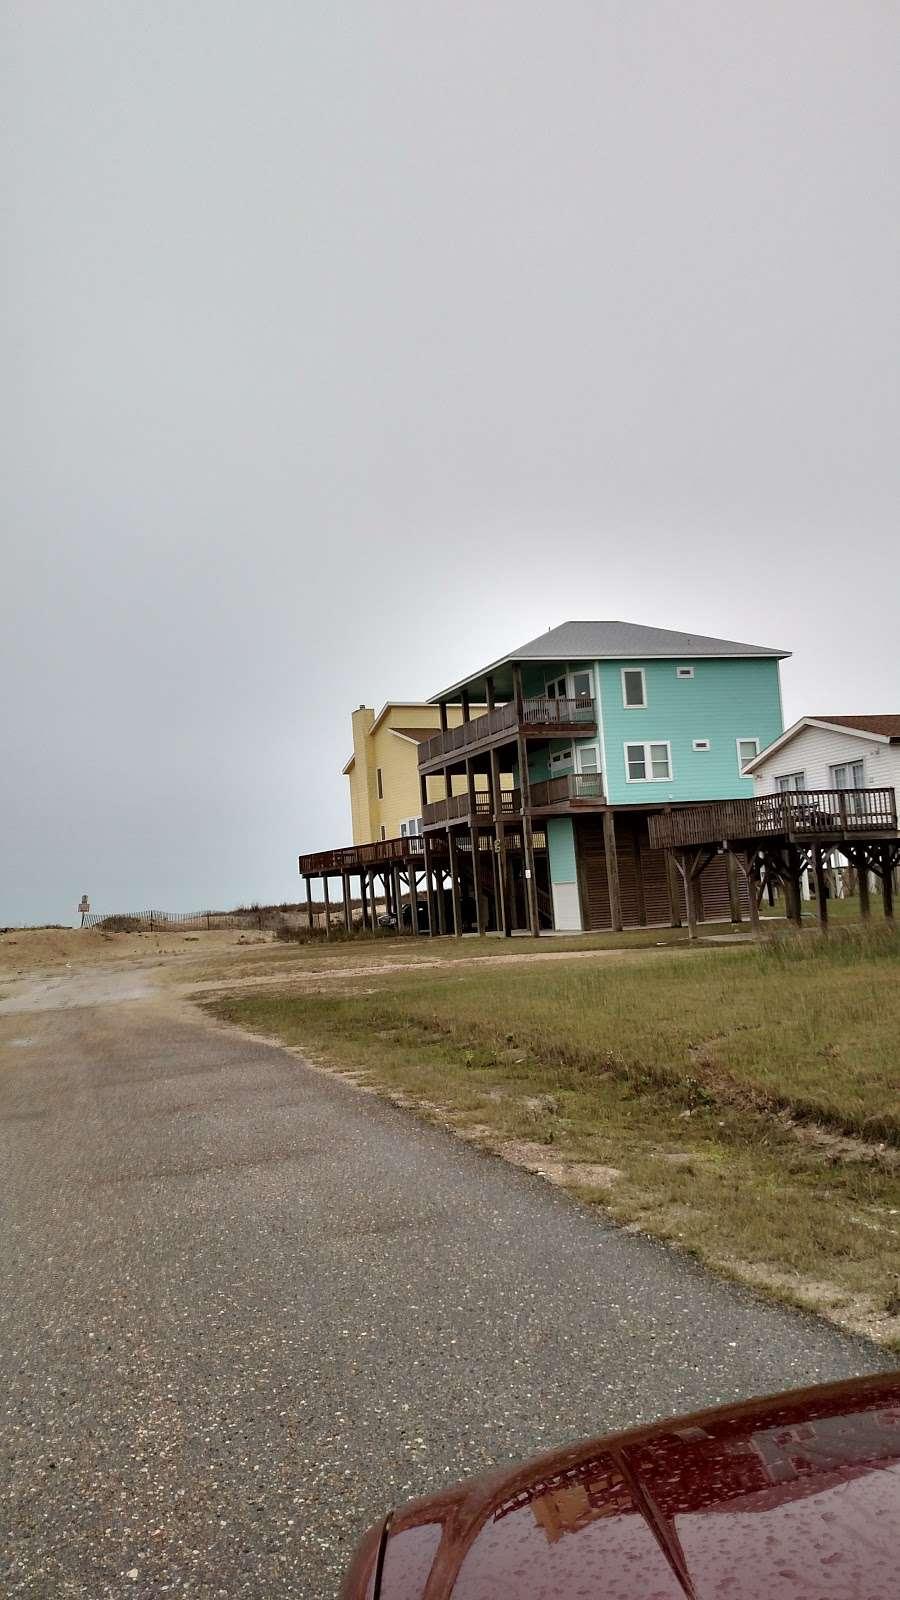 Hunts Treasure Beach House - real estate agency  | Photo 3 of 10 | Address: 12923 Jolly Roger Dr, Freeport, TX 77541, USA | Phone: (888) 573-4868